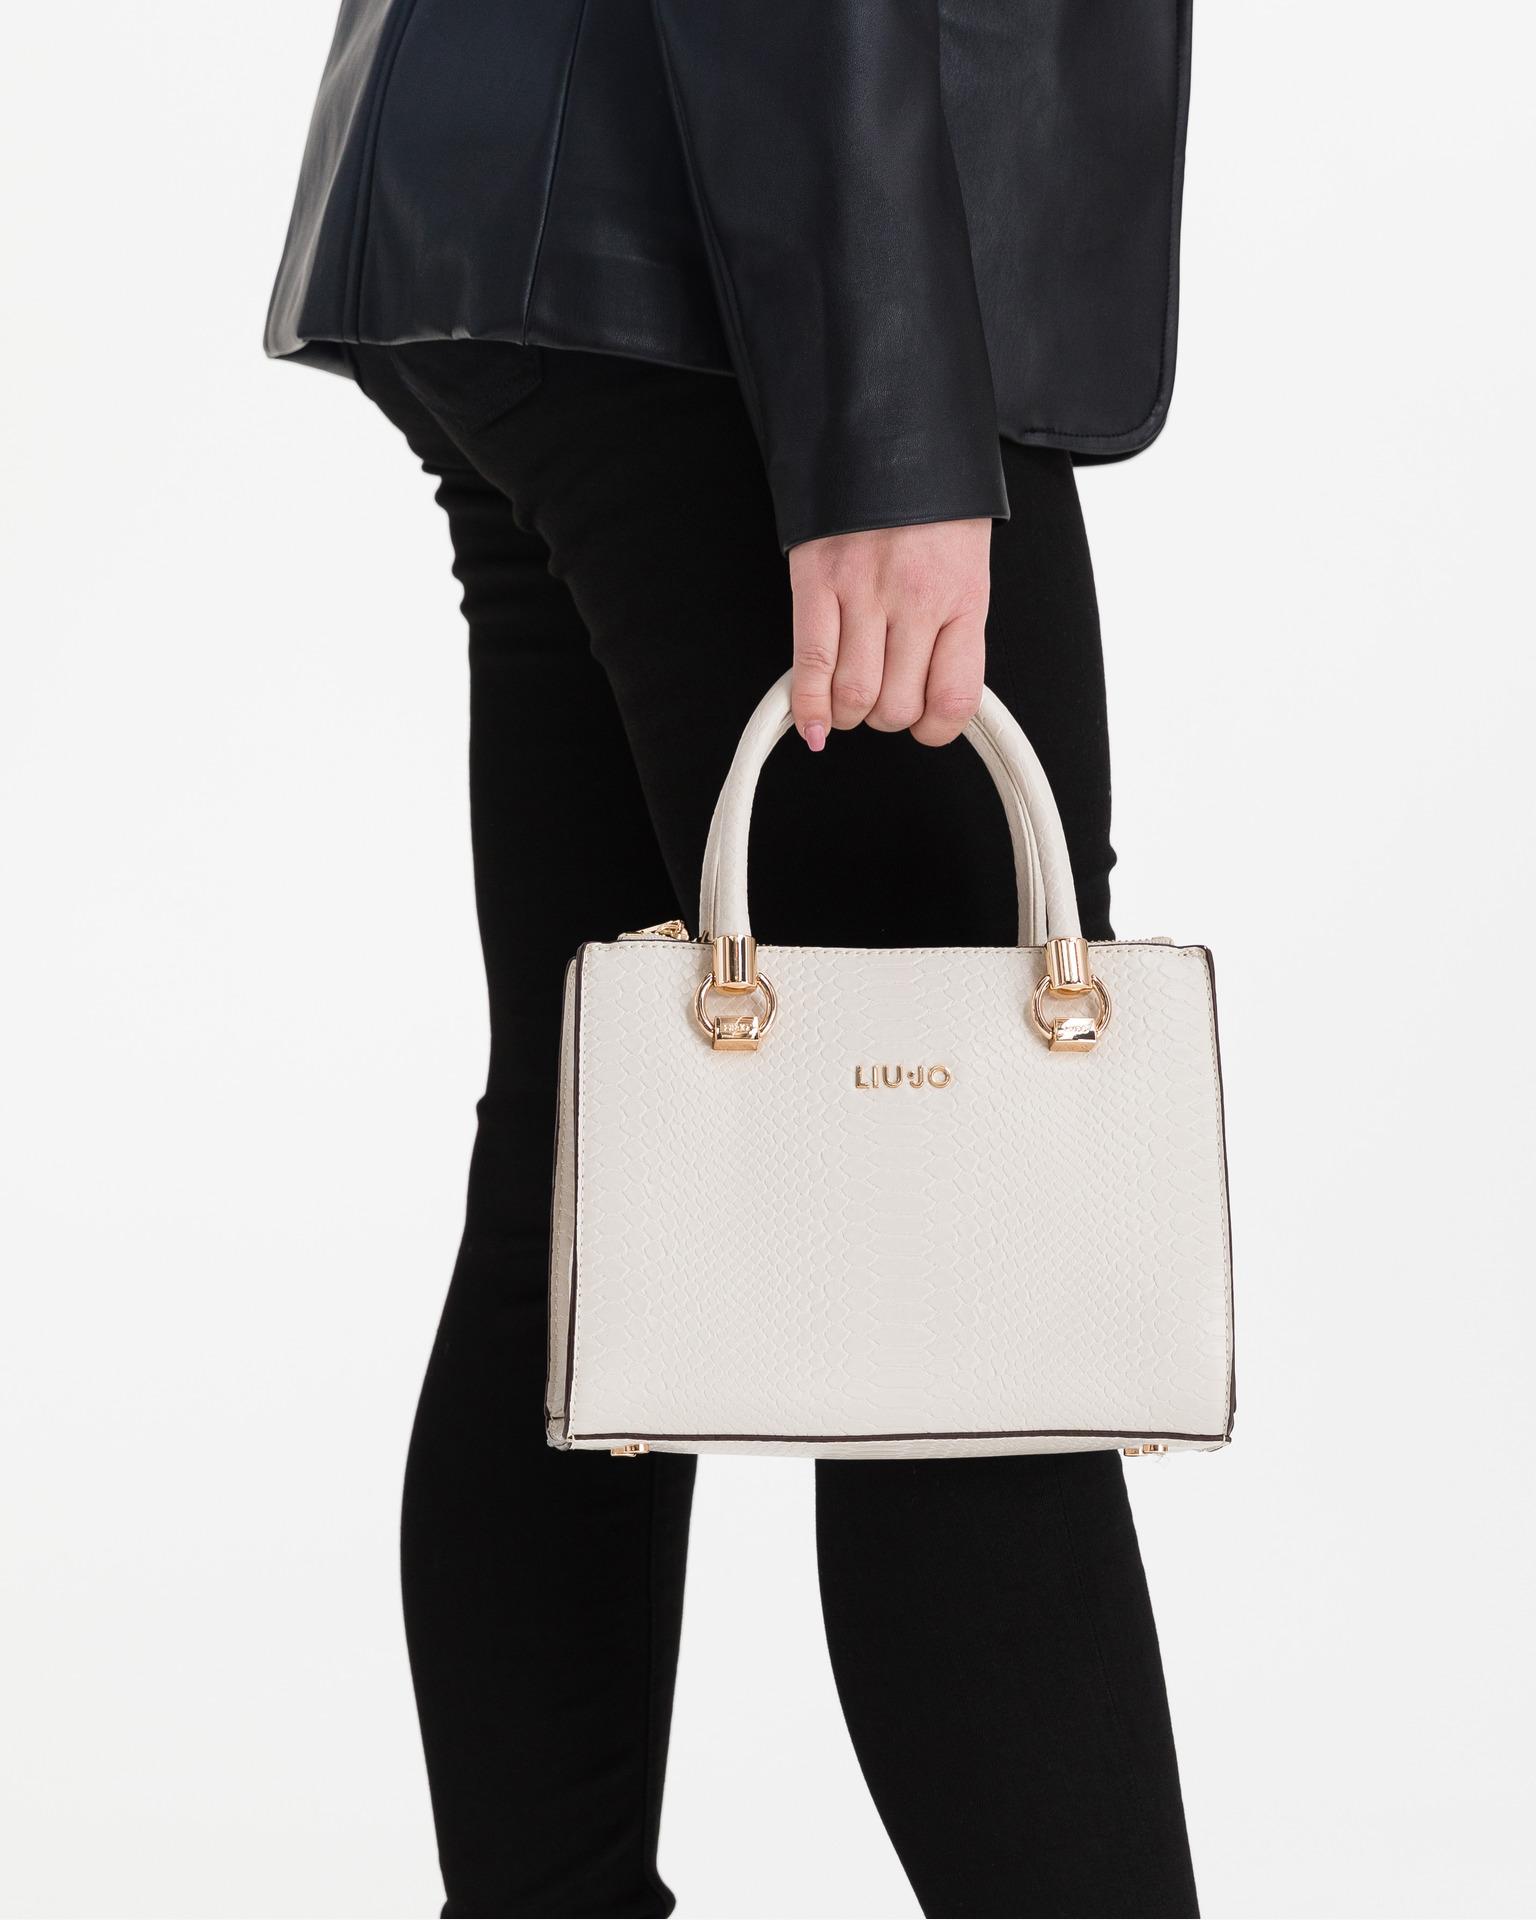 Liu Jo beige handbag